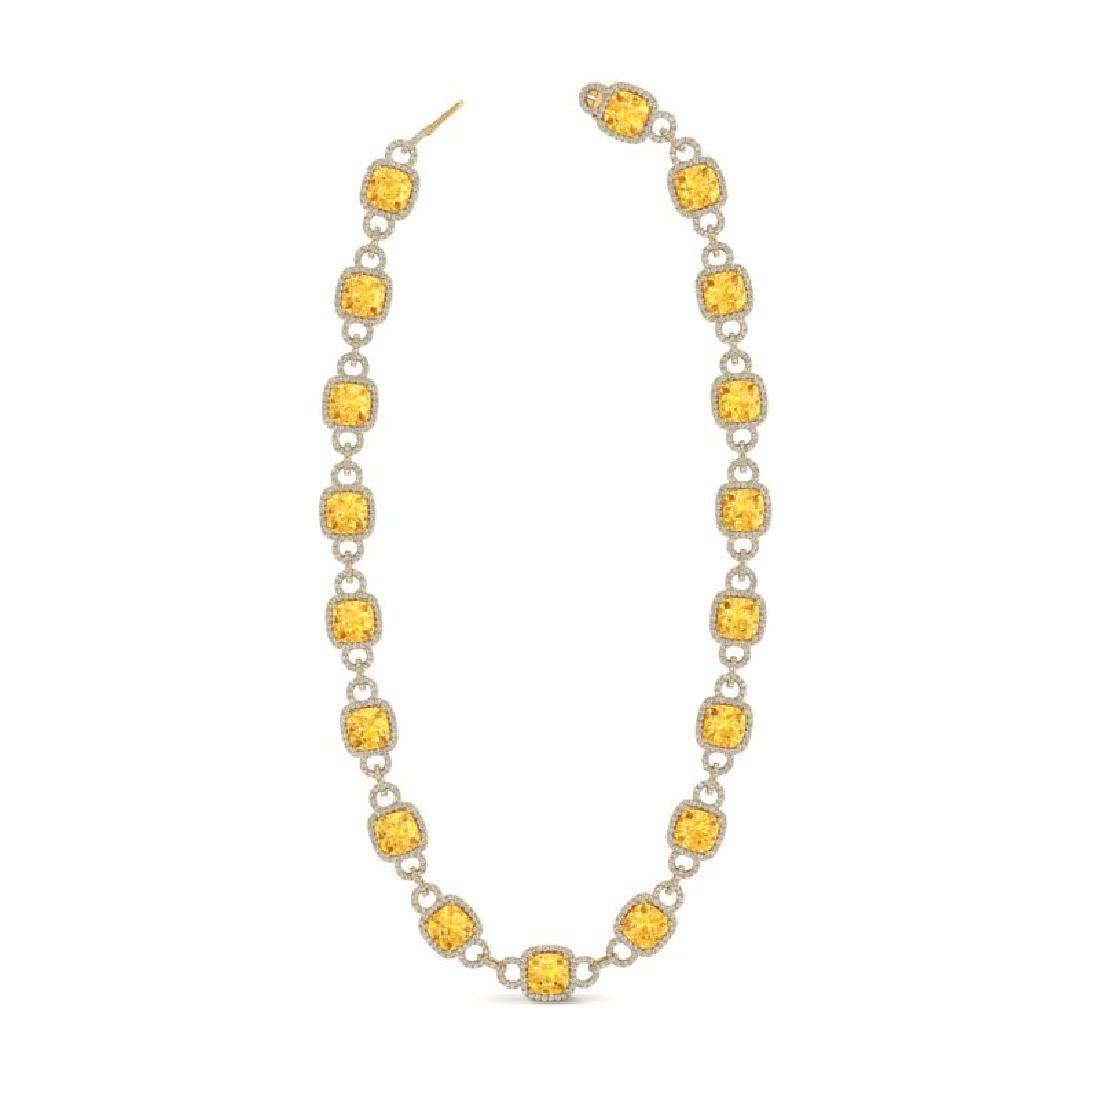 66 CTW Citrine & VS/SI Diamond Necklace 14K Yellow Gold - 2